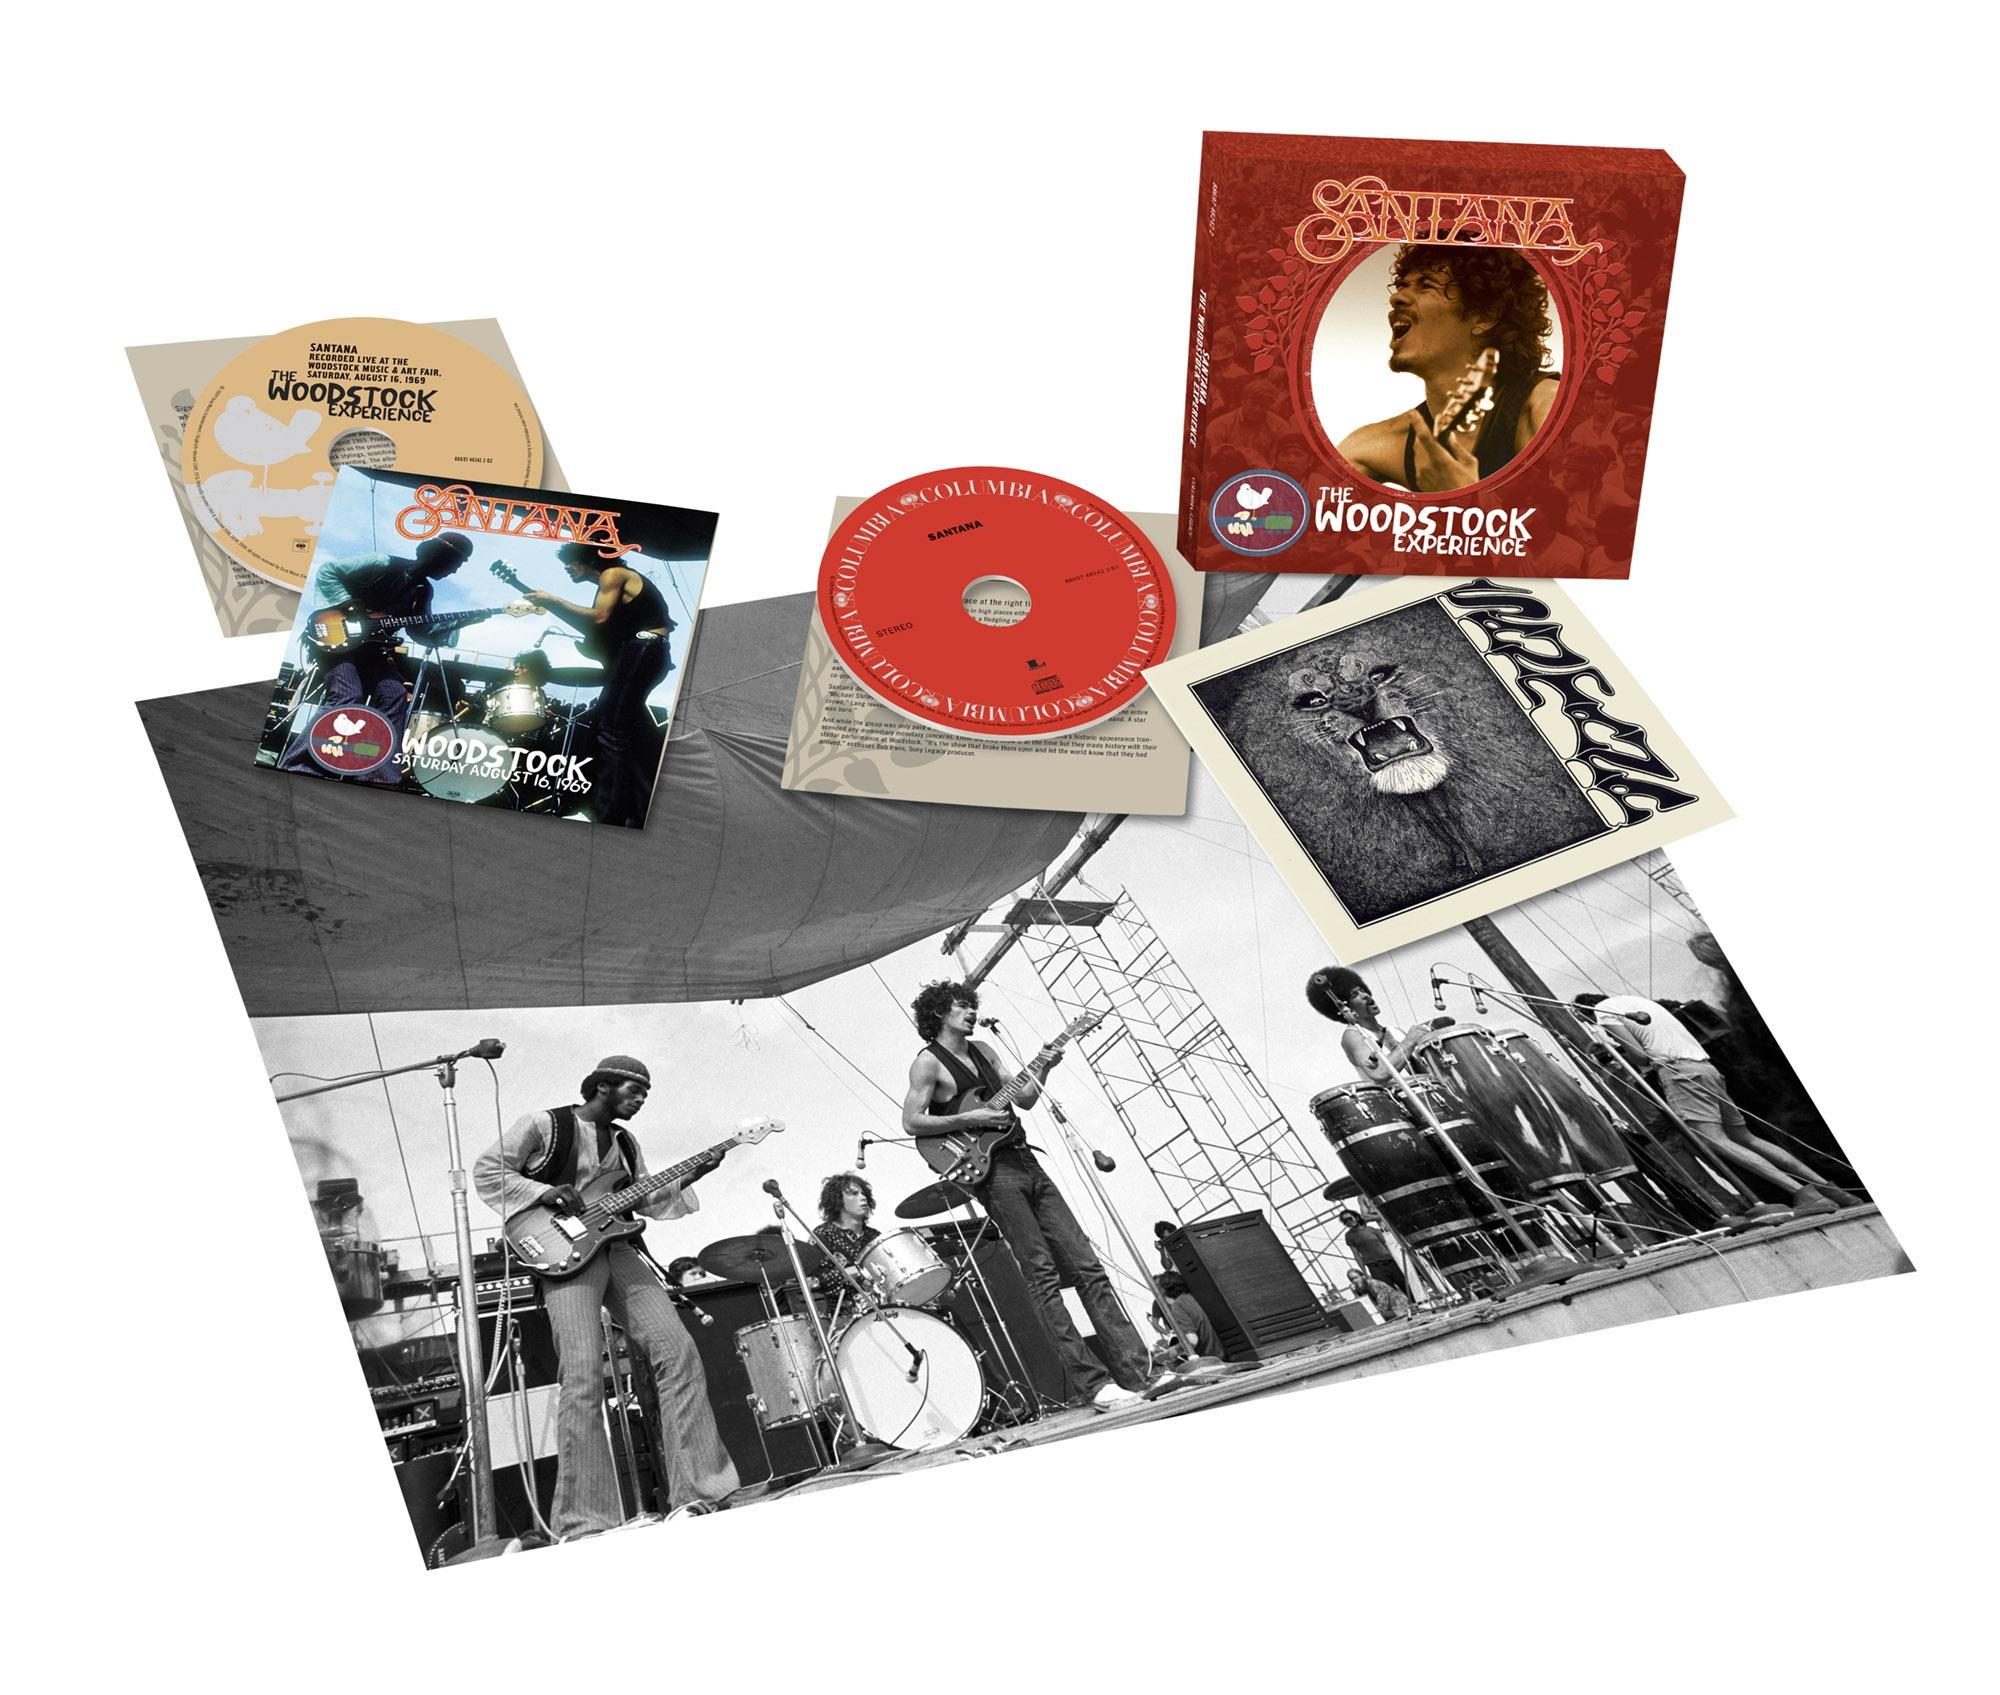 Santana (The Woodstock Experience) | Woodstock Wiki | FANDOM